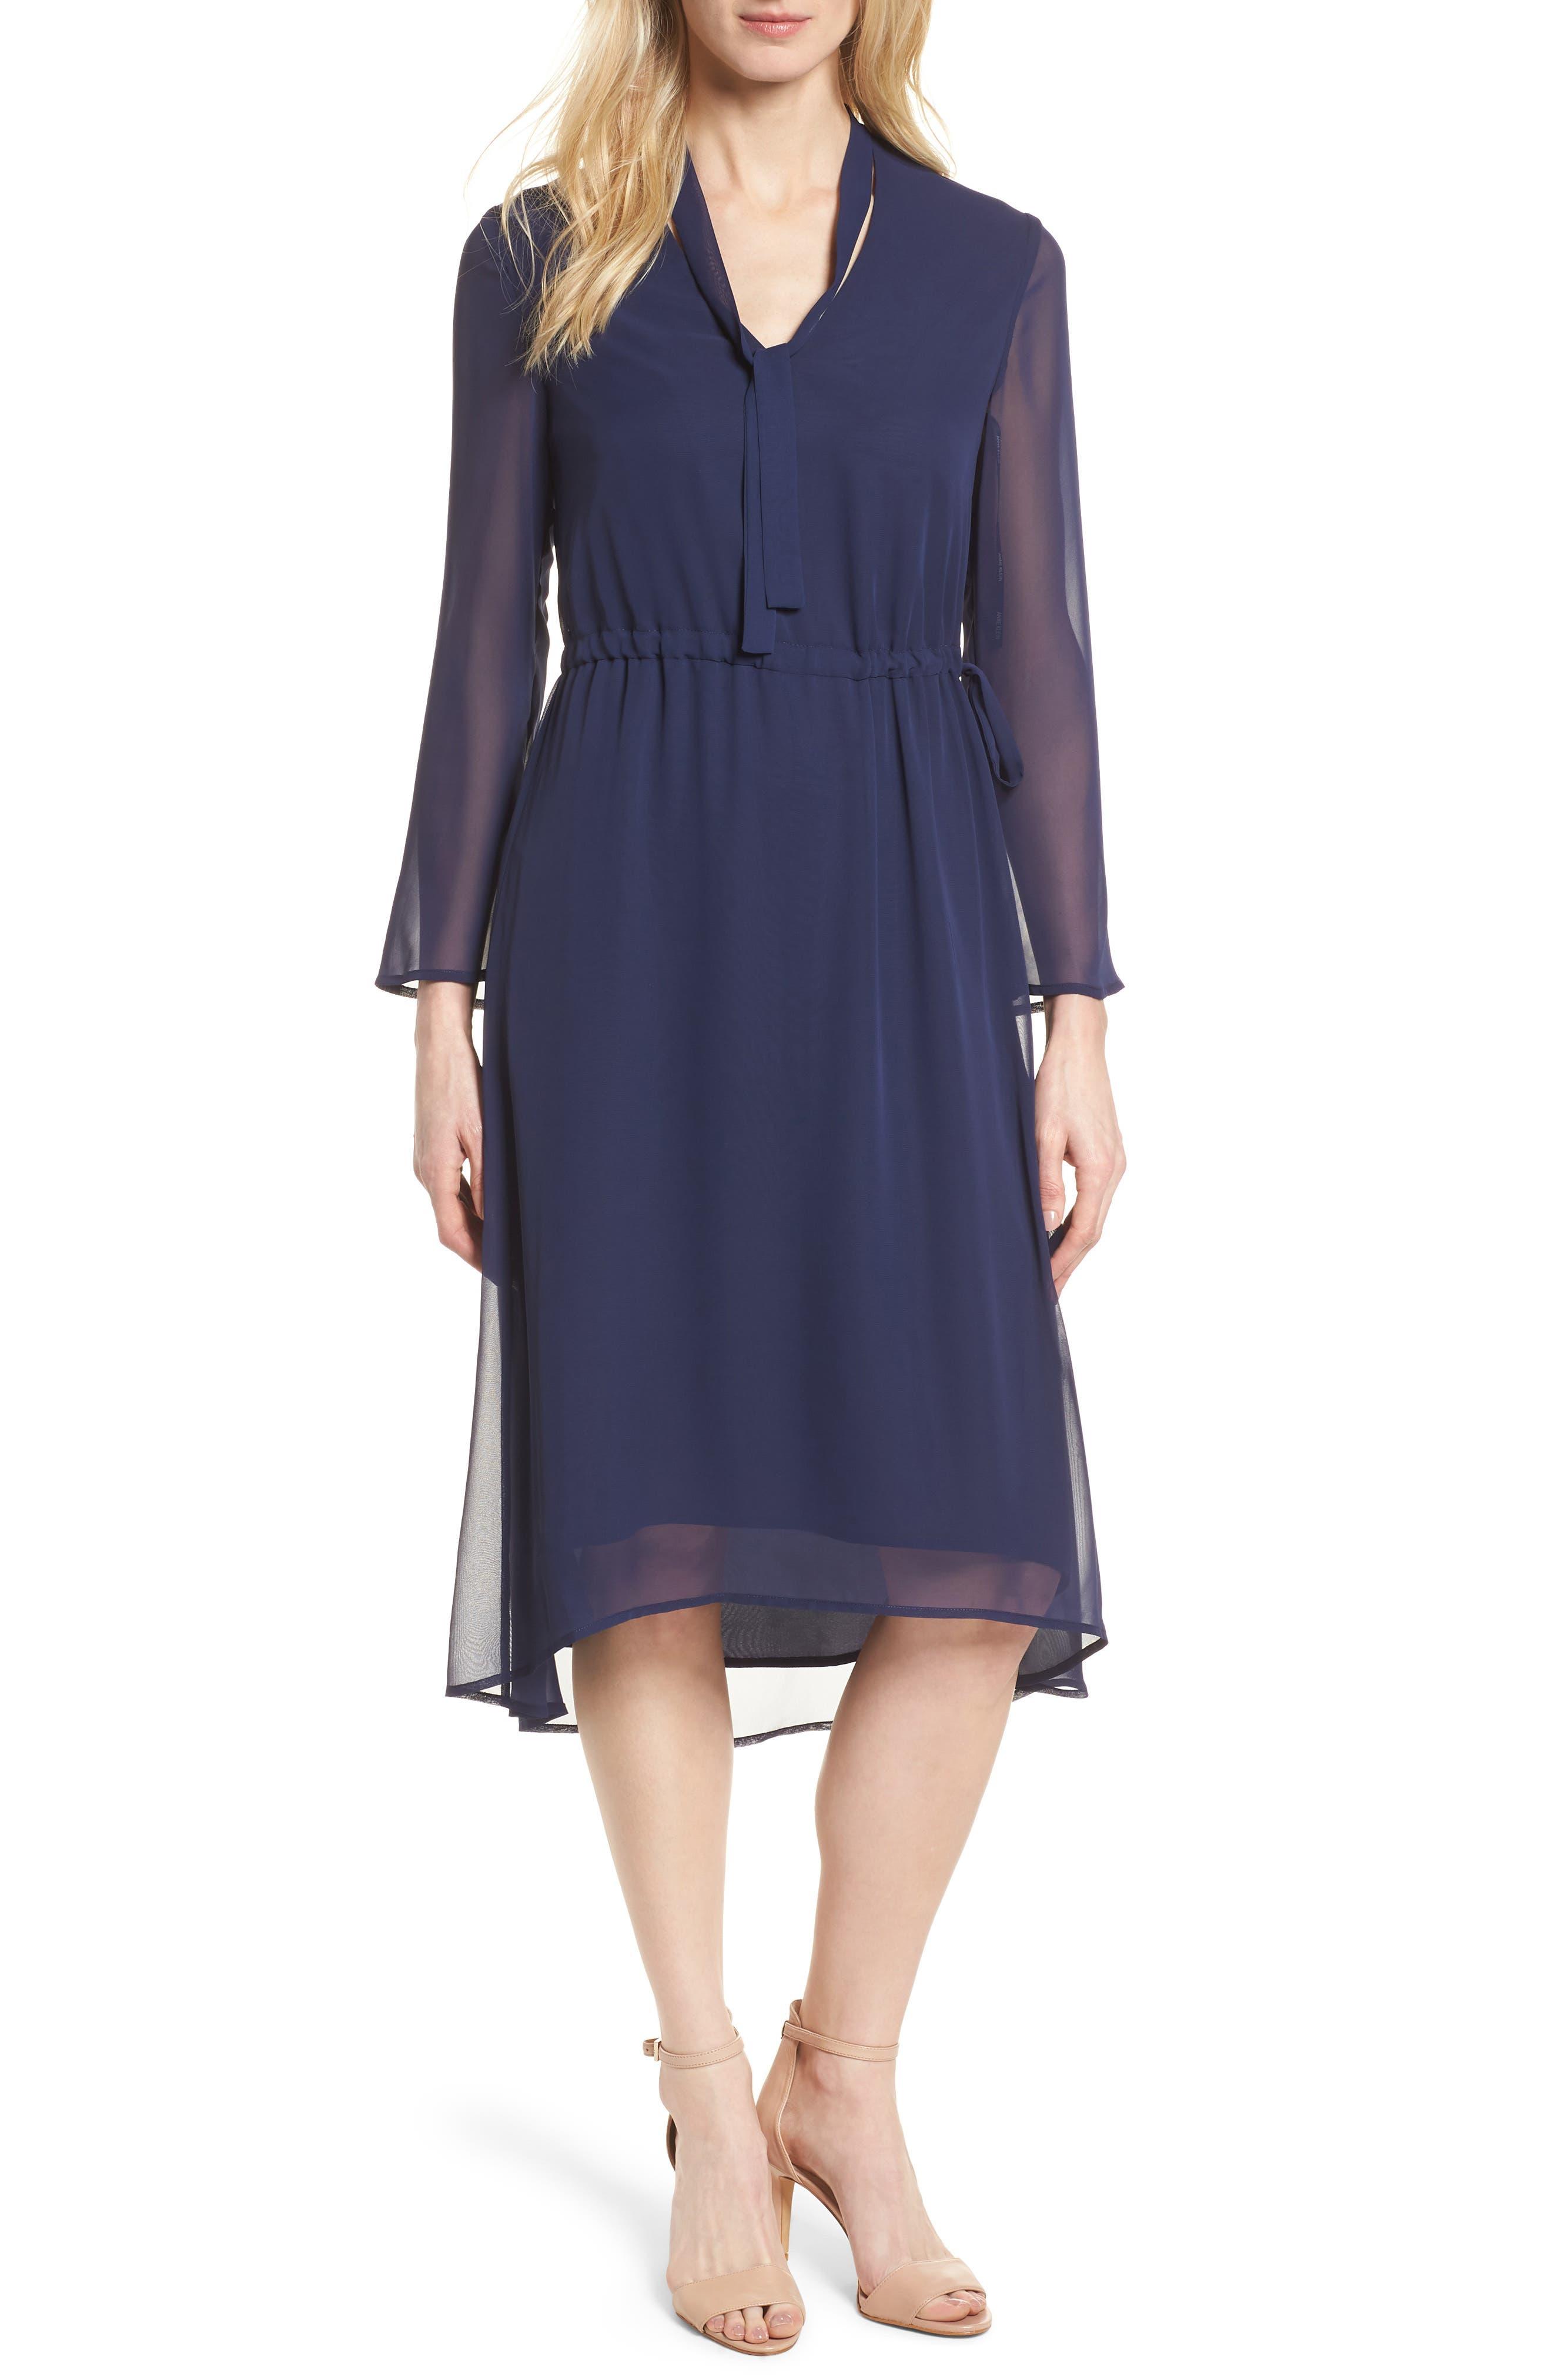 Sheer Overlay Tie Dress,                         Main,                         color, Breton Blue